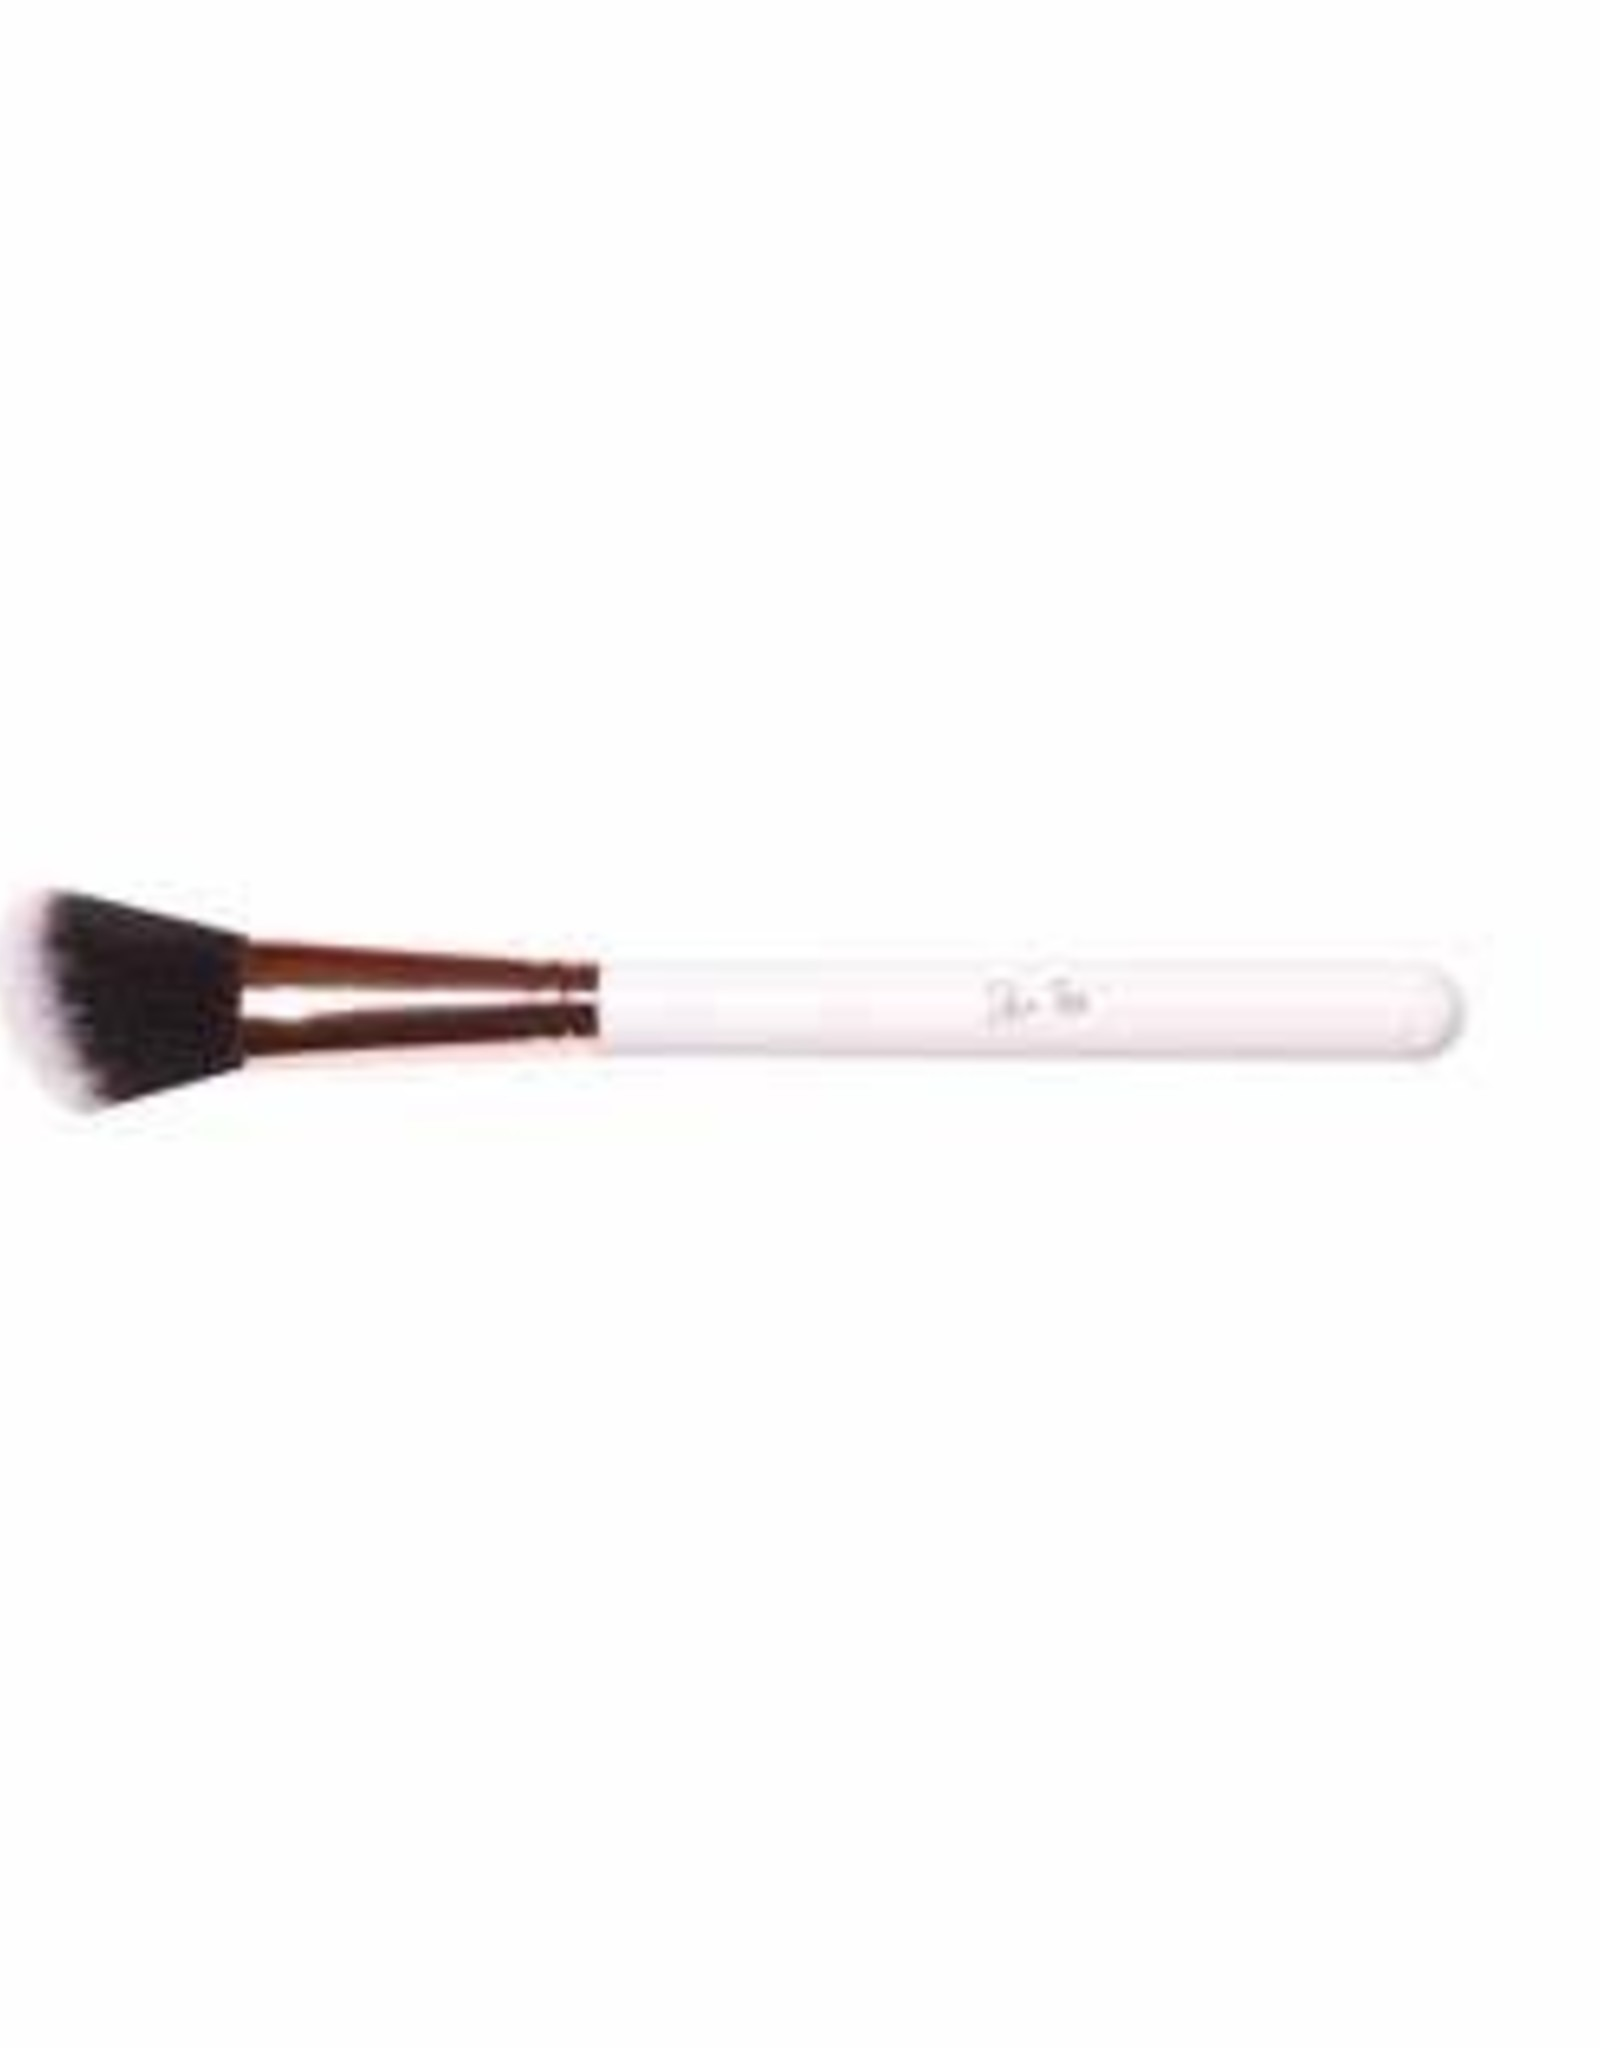 She-Iss She-Iss - Blush brush